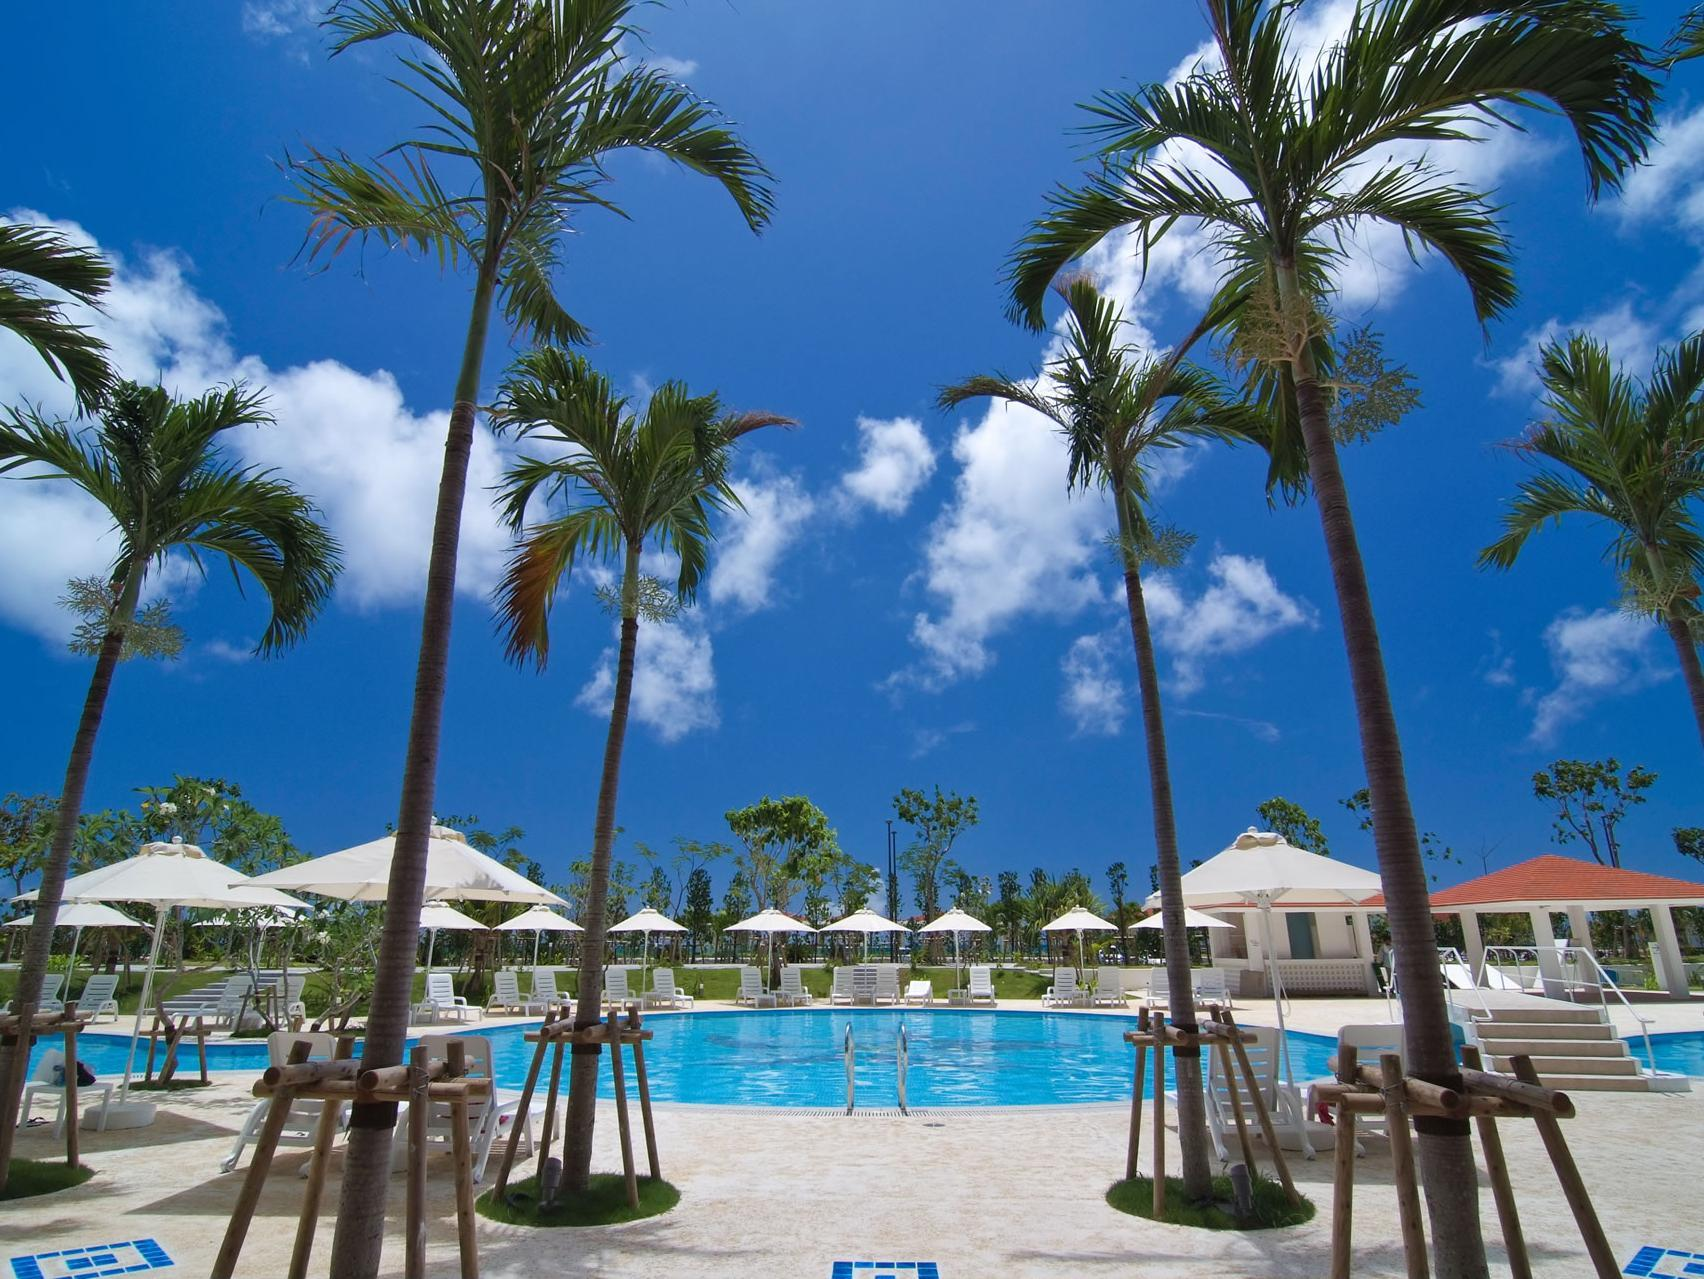 Southern Beach Hotel And Resort Okinawa